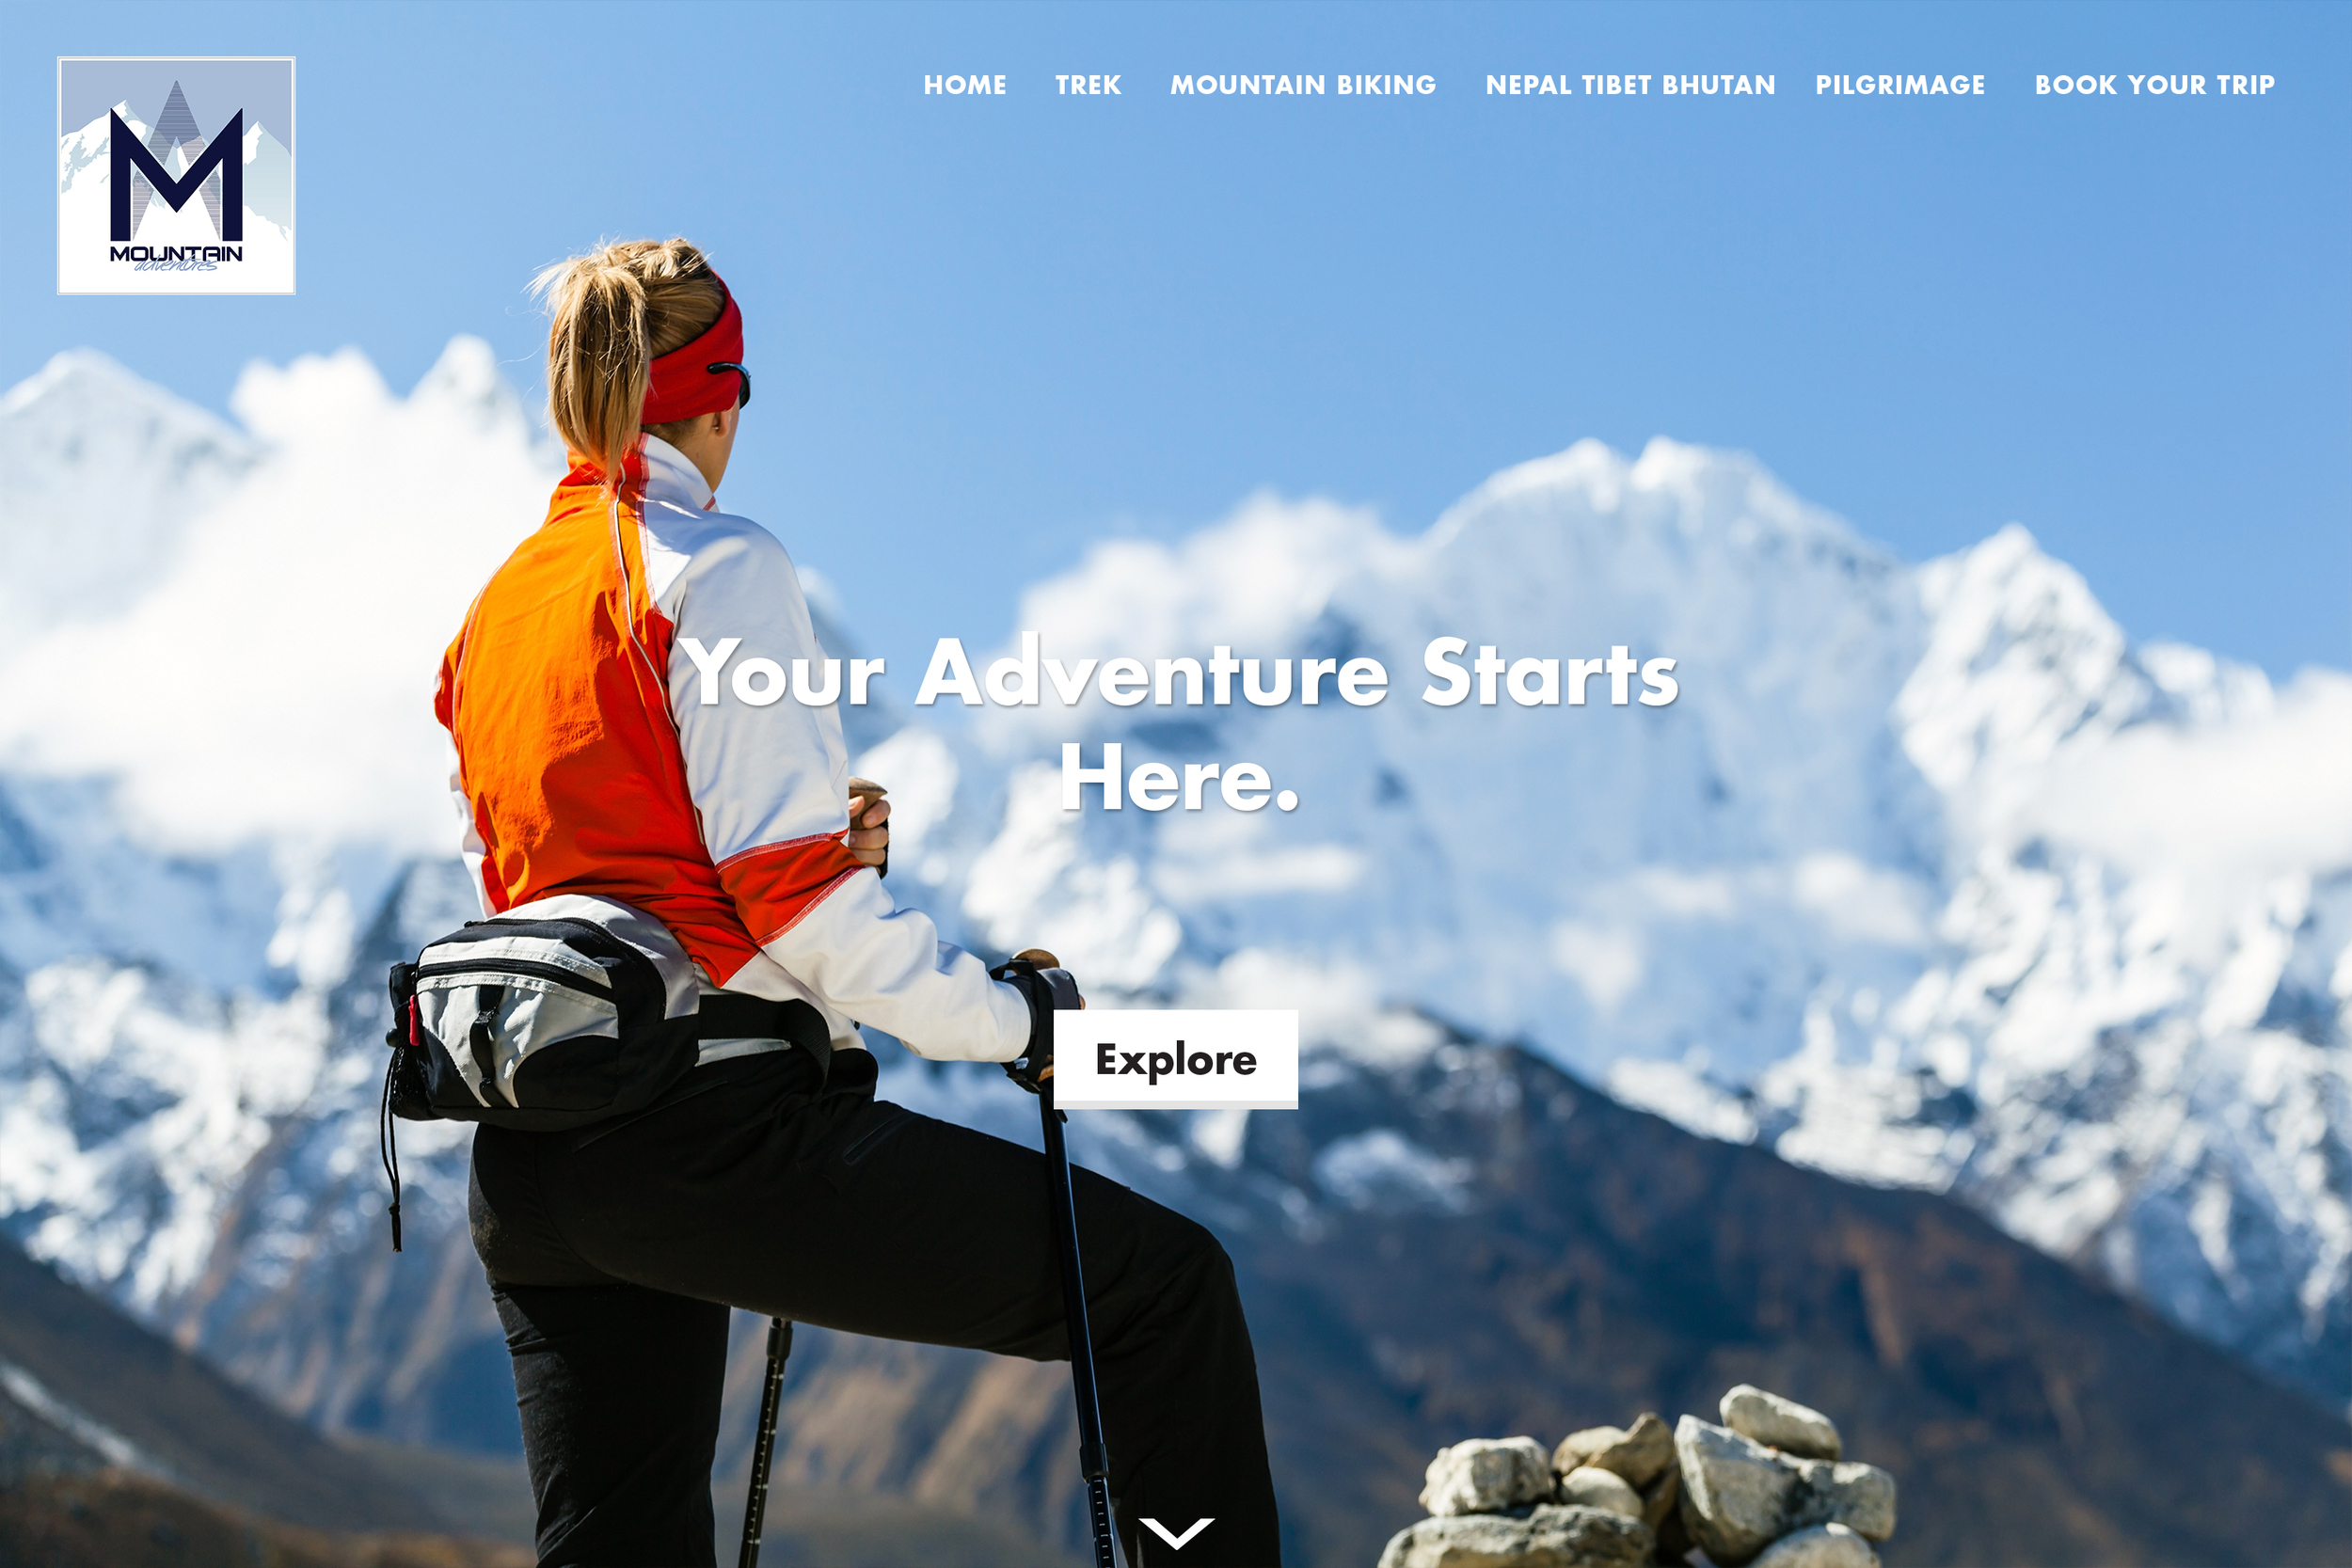 Mountain Adventures [Web Finish] by Graham Hnedak Brand G Creative 09 JAN 2015.jpg